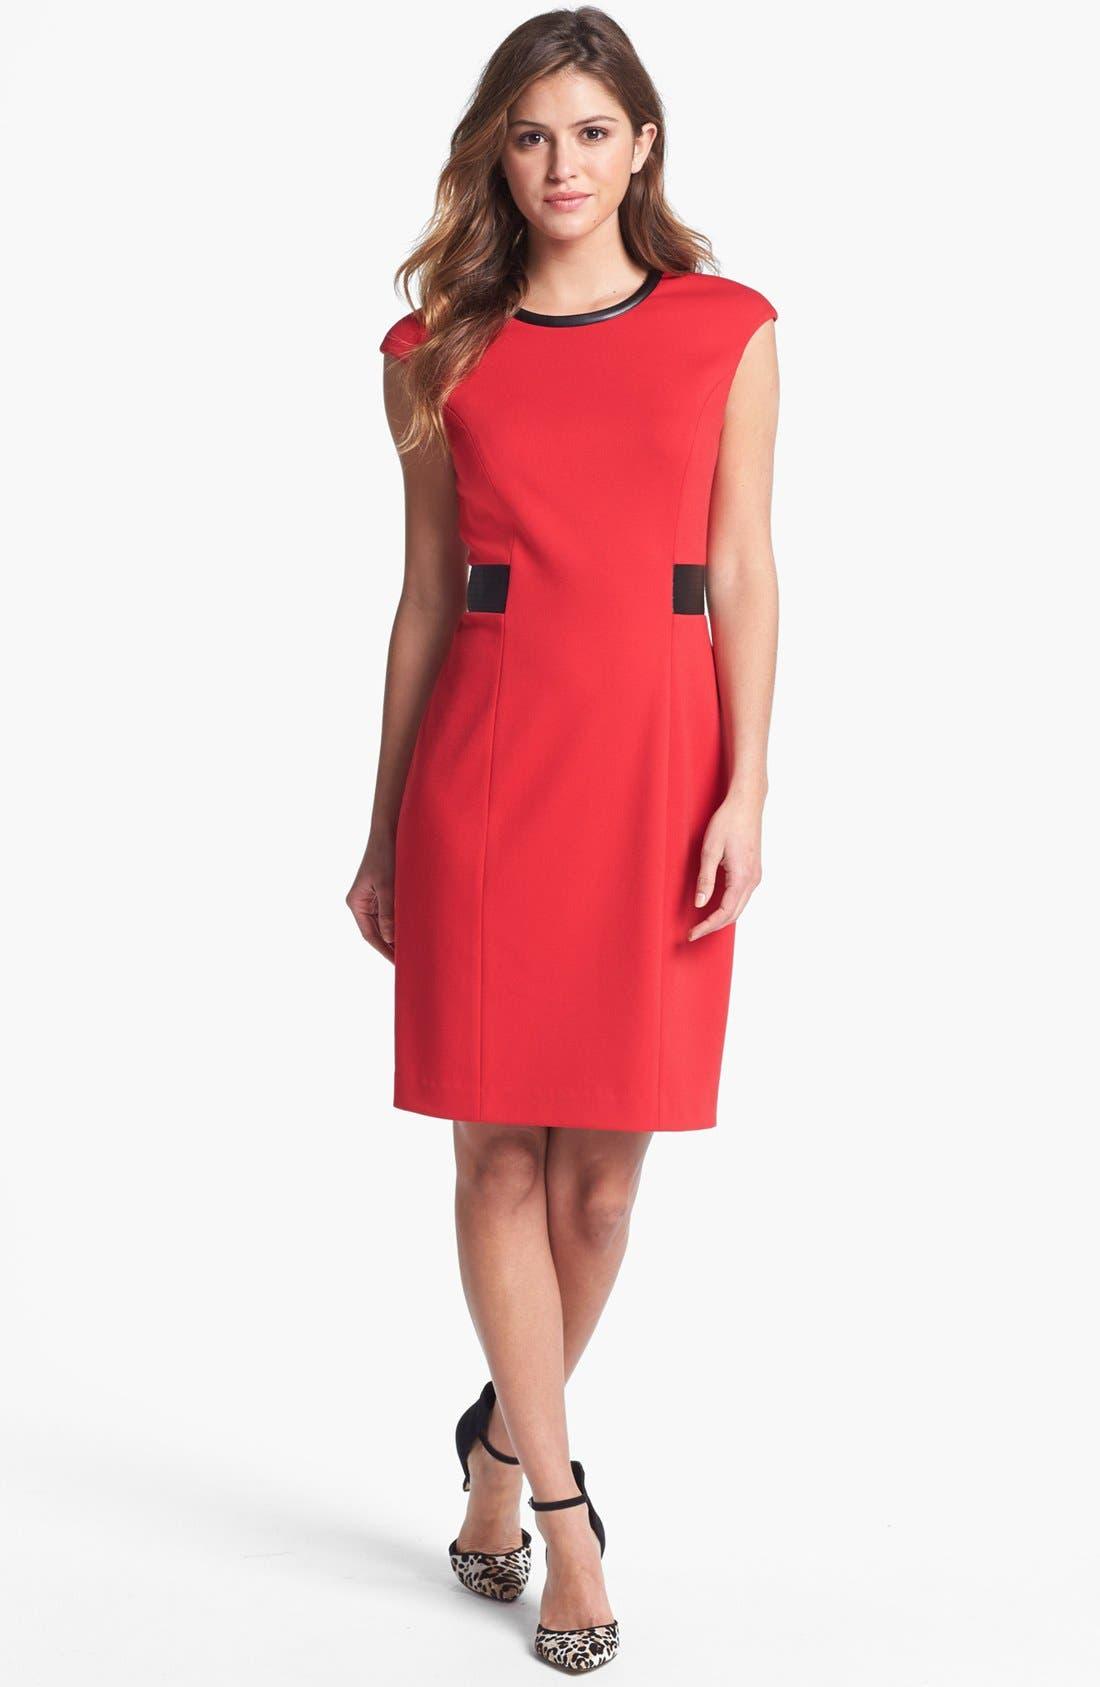 Alternate Image 1 Selected - Calvin Klein Faux Leather Trim Ponte Sheath Dress